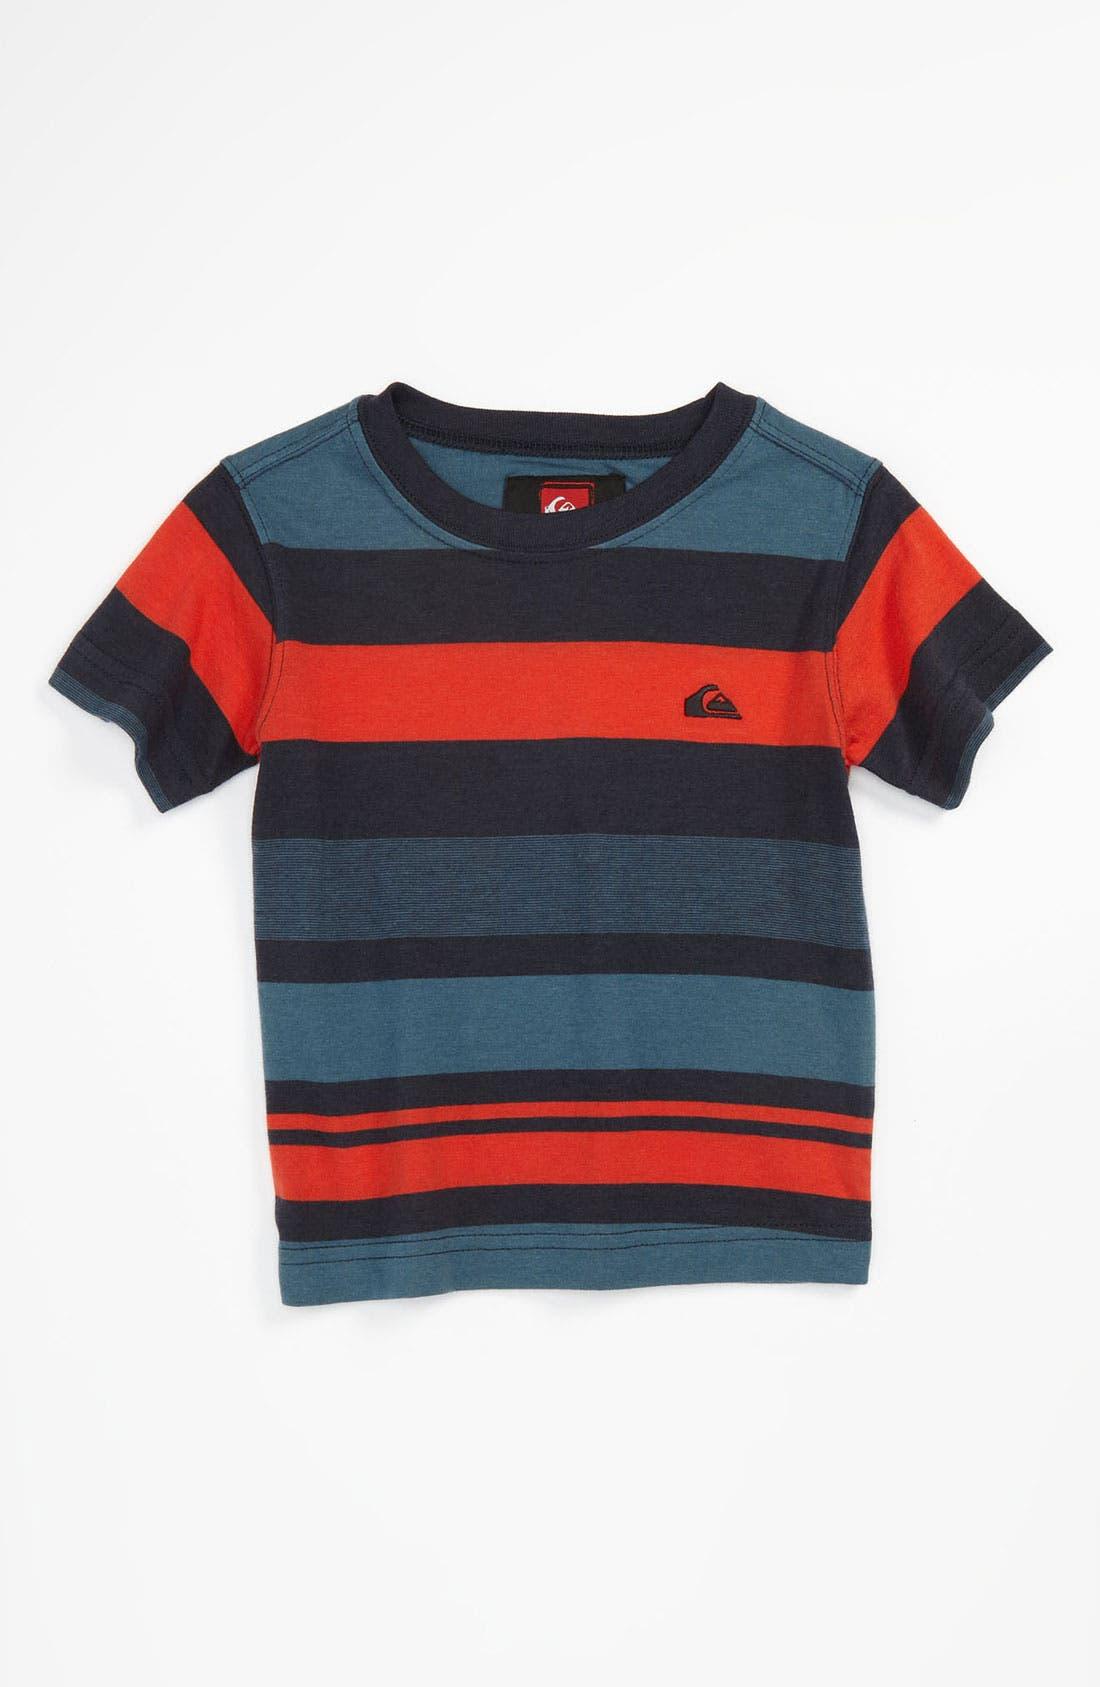 Main Image - Quiksilver 'Reasoner' T-Shirt (Infant)